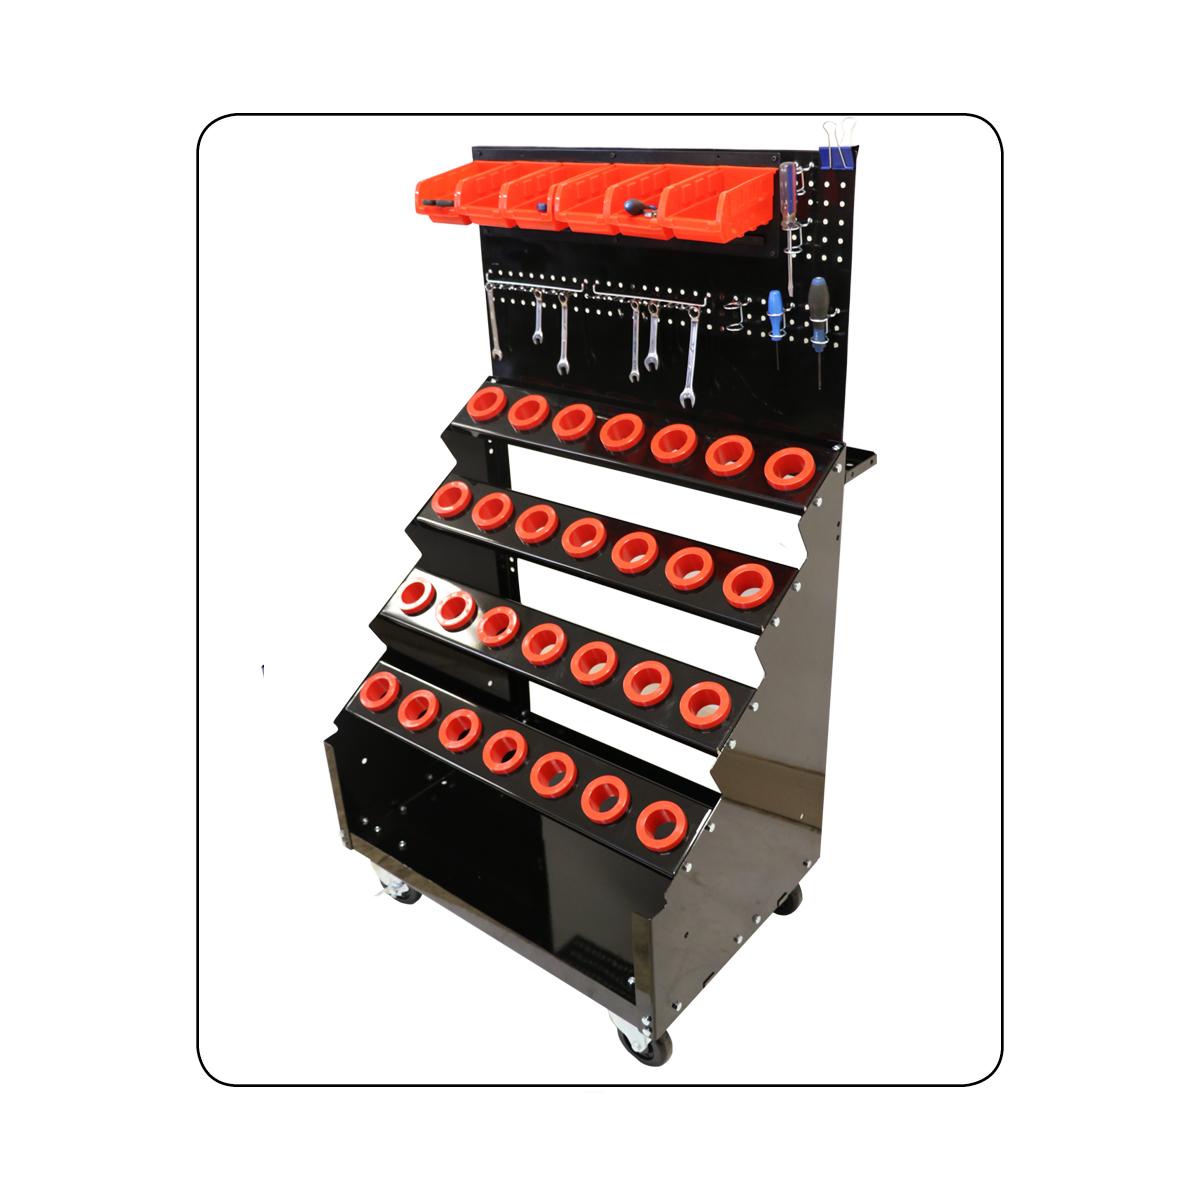 CNC Tool Carts - Steps model